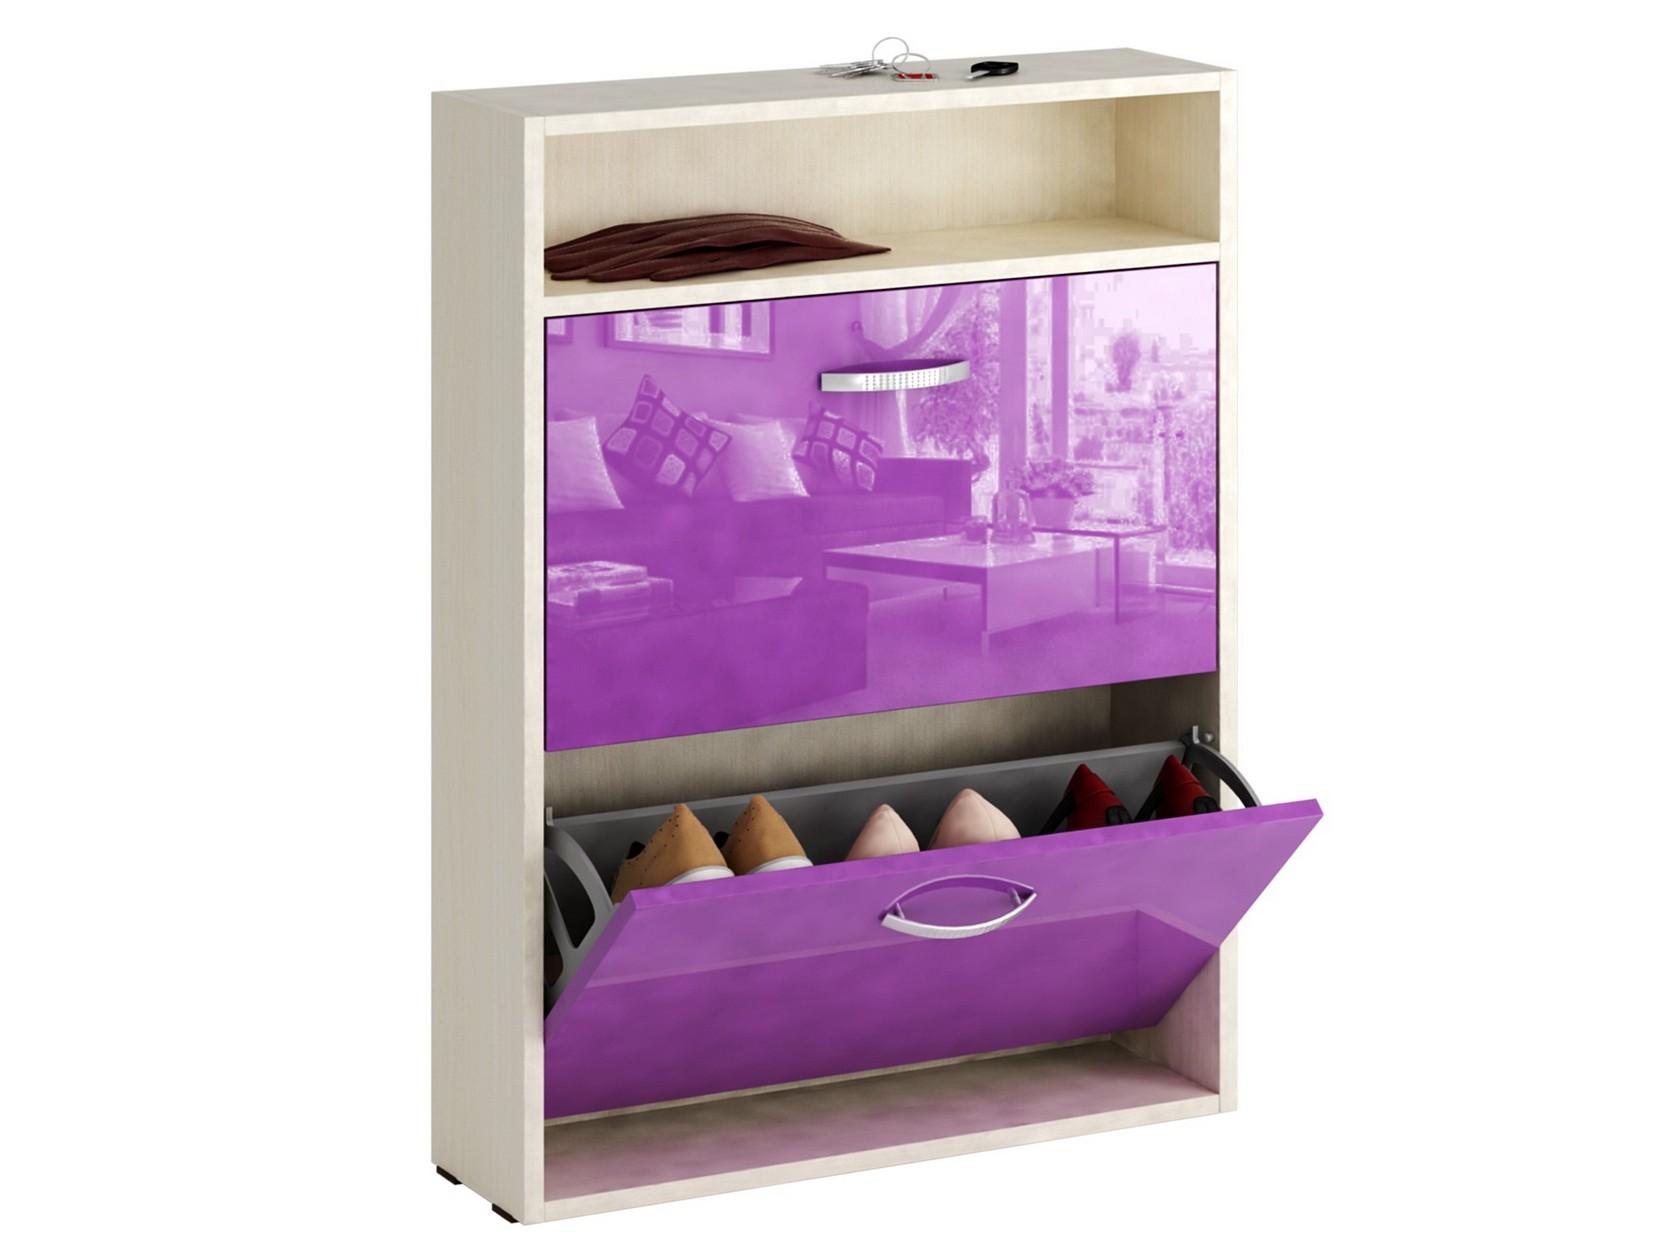 Обувница MFMaster Милан-25 МСТ-ОДМ-25У 60х17х88,2 см, дуб молочный/фиолетовый глянец